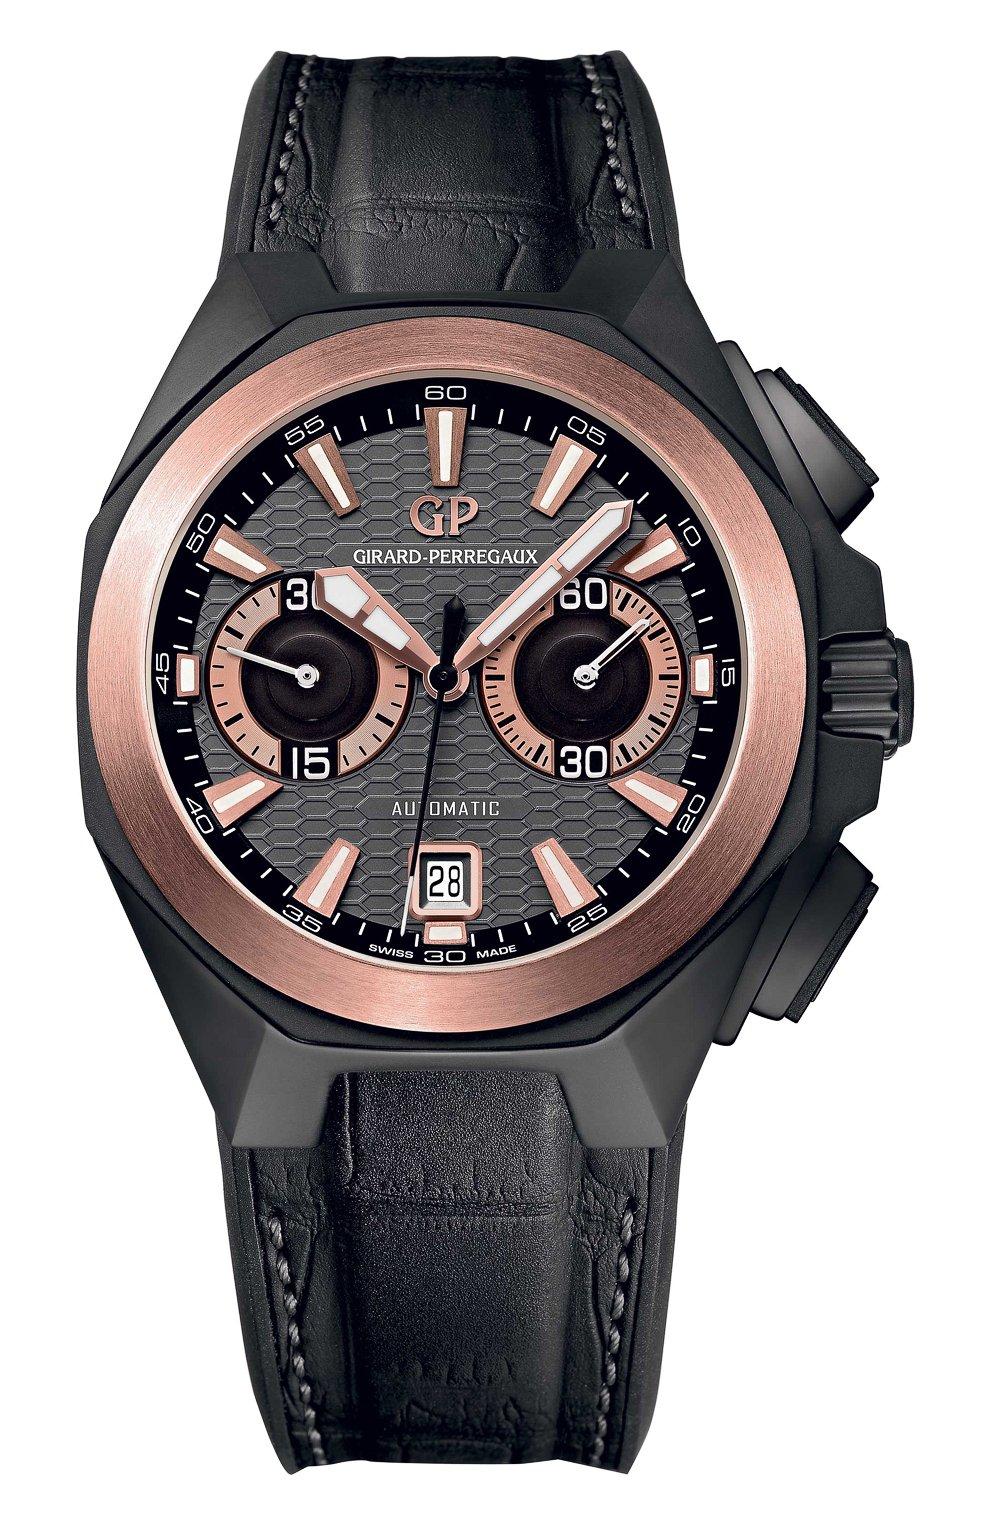 Мужские часы chrono hawk hollywood GIRARD-PERREGAUX бесцветного цвета, арт. 49970-34-232-BB6A | Фото 1 (Материал корпуса: Другое; Механизм: Автомат; Цвет циферблата: Другое)